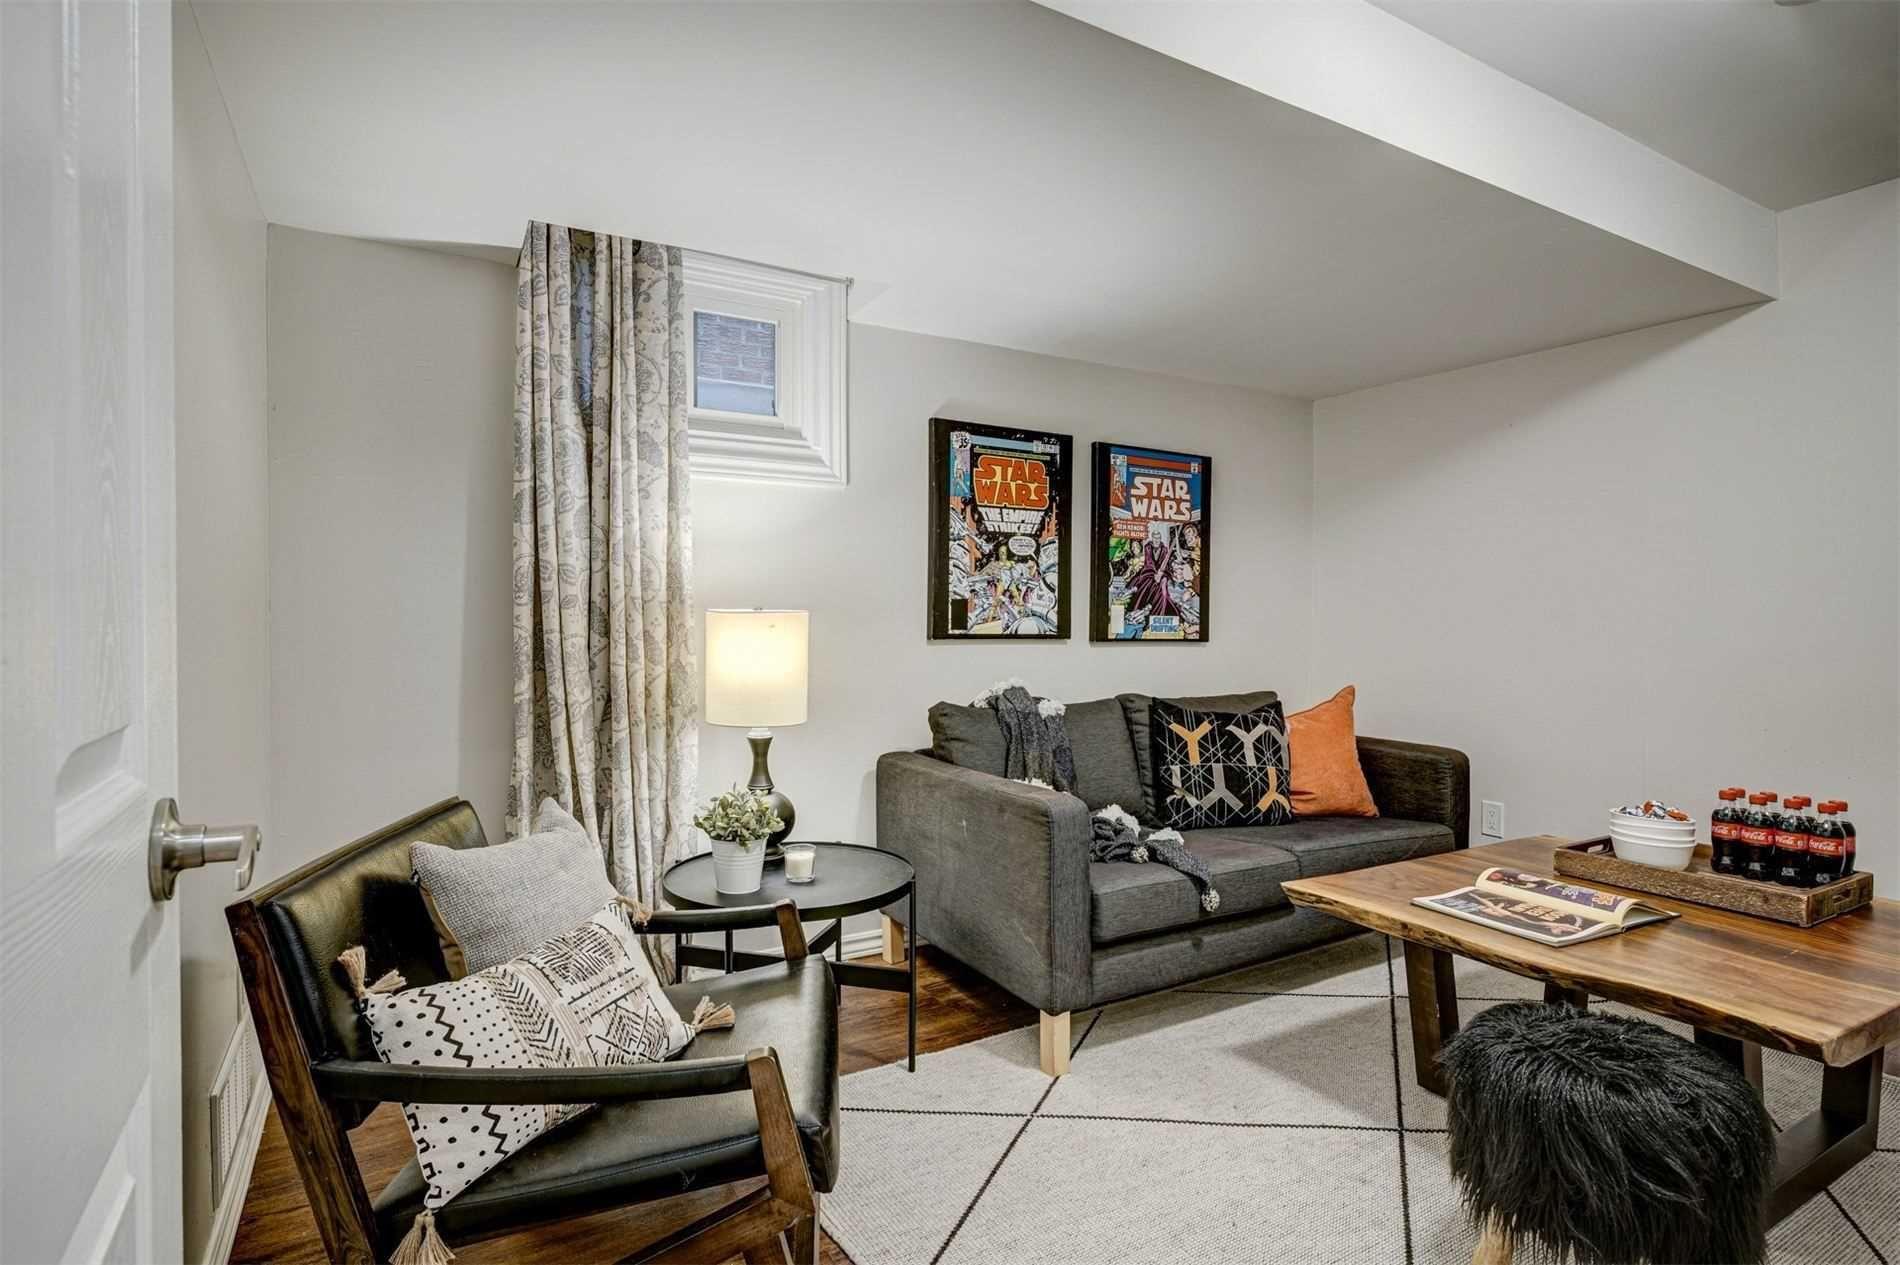 Photo 25: Photos: 92 Holborne Avenue in Toronto: Danforth Village-East York House (2-Storey) for sale (Toronto E03)  : MLS®# E5204452